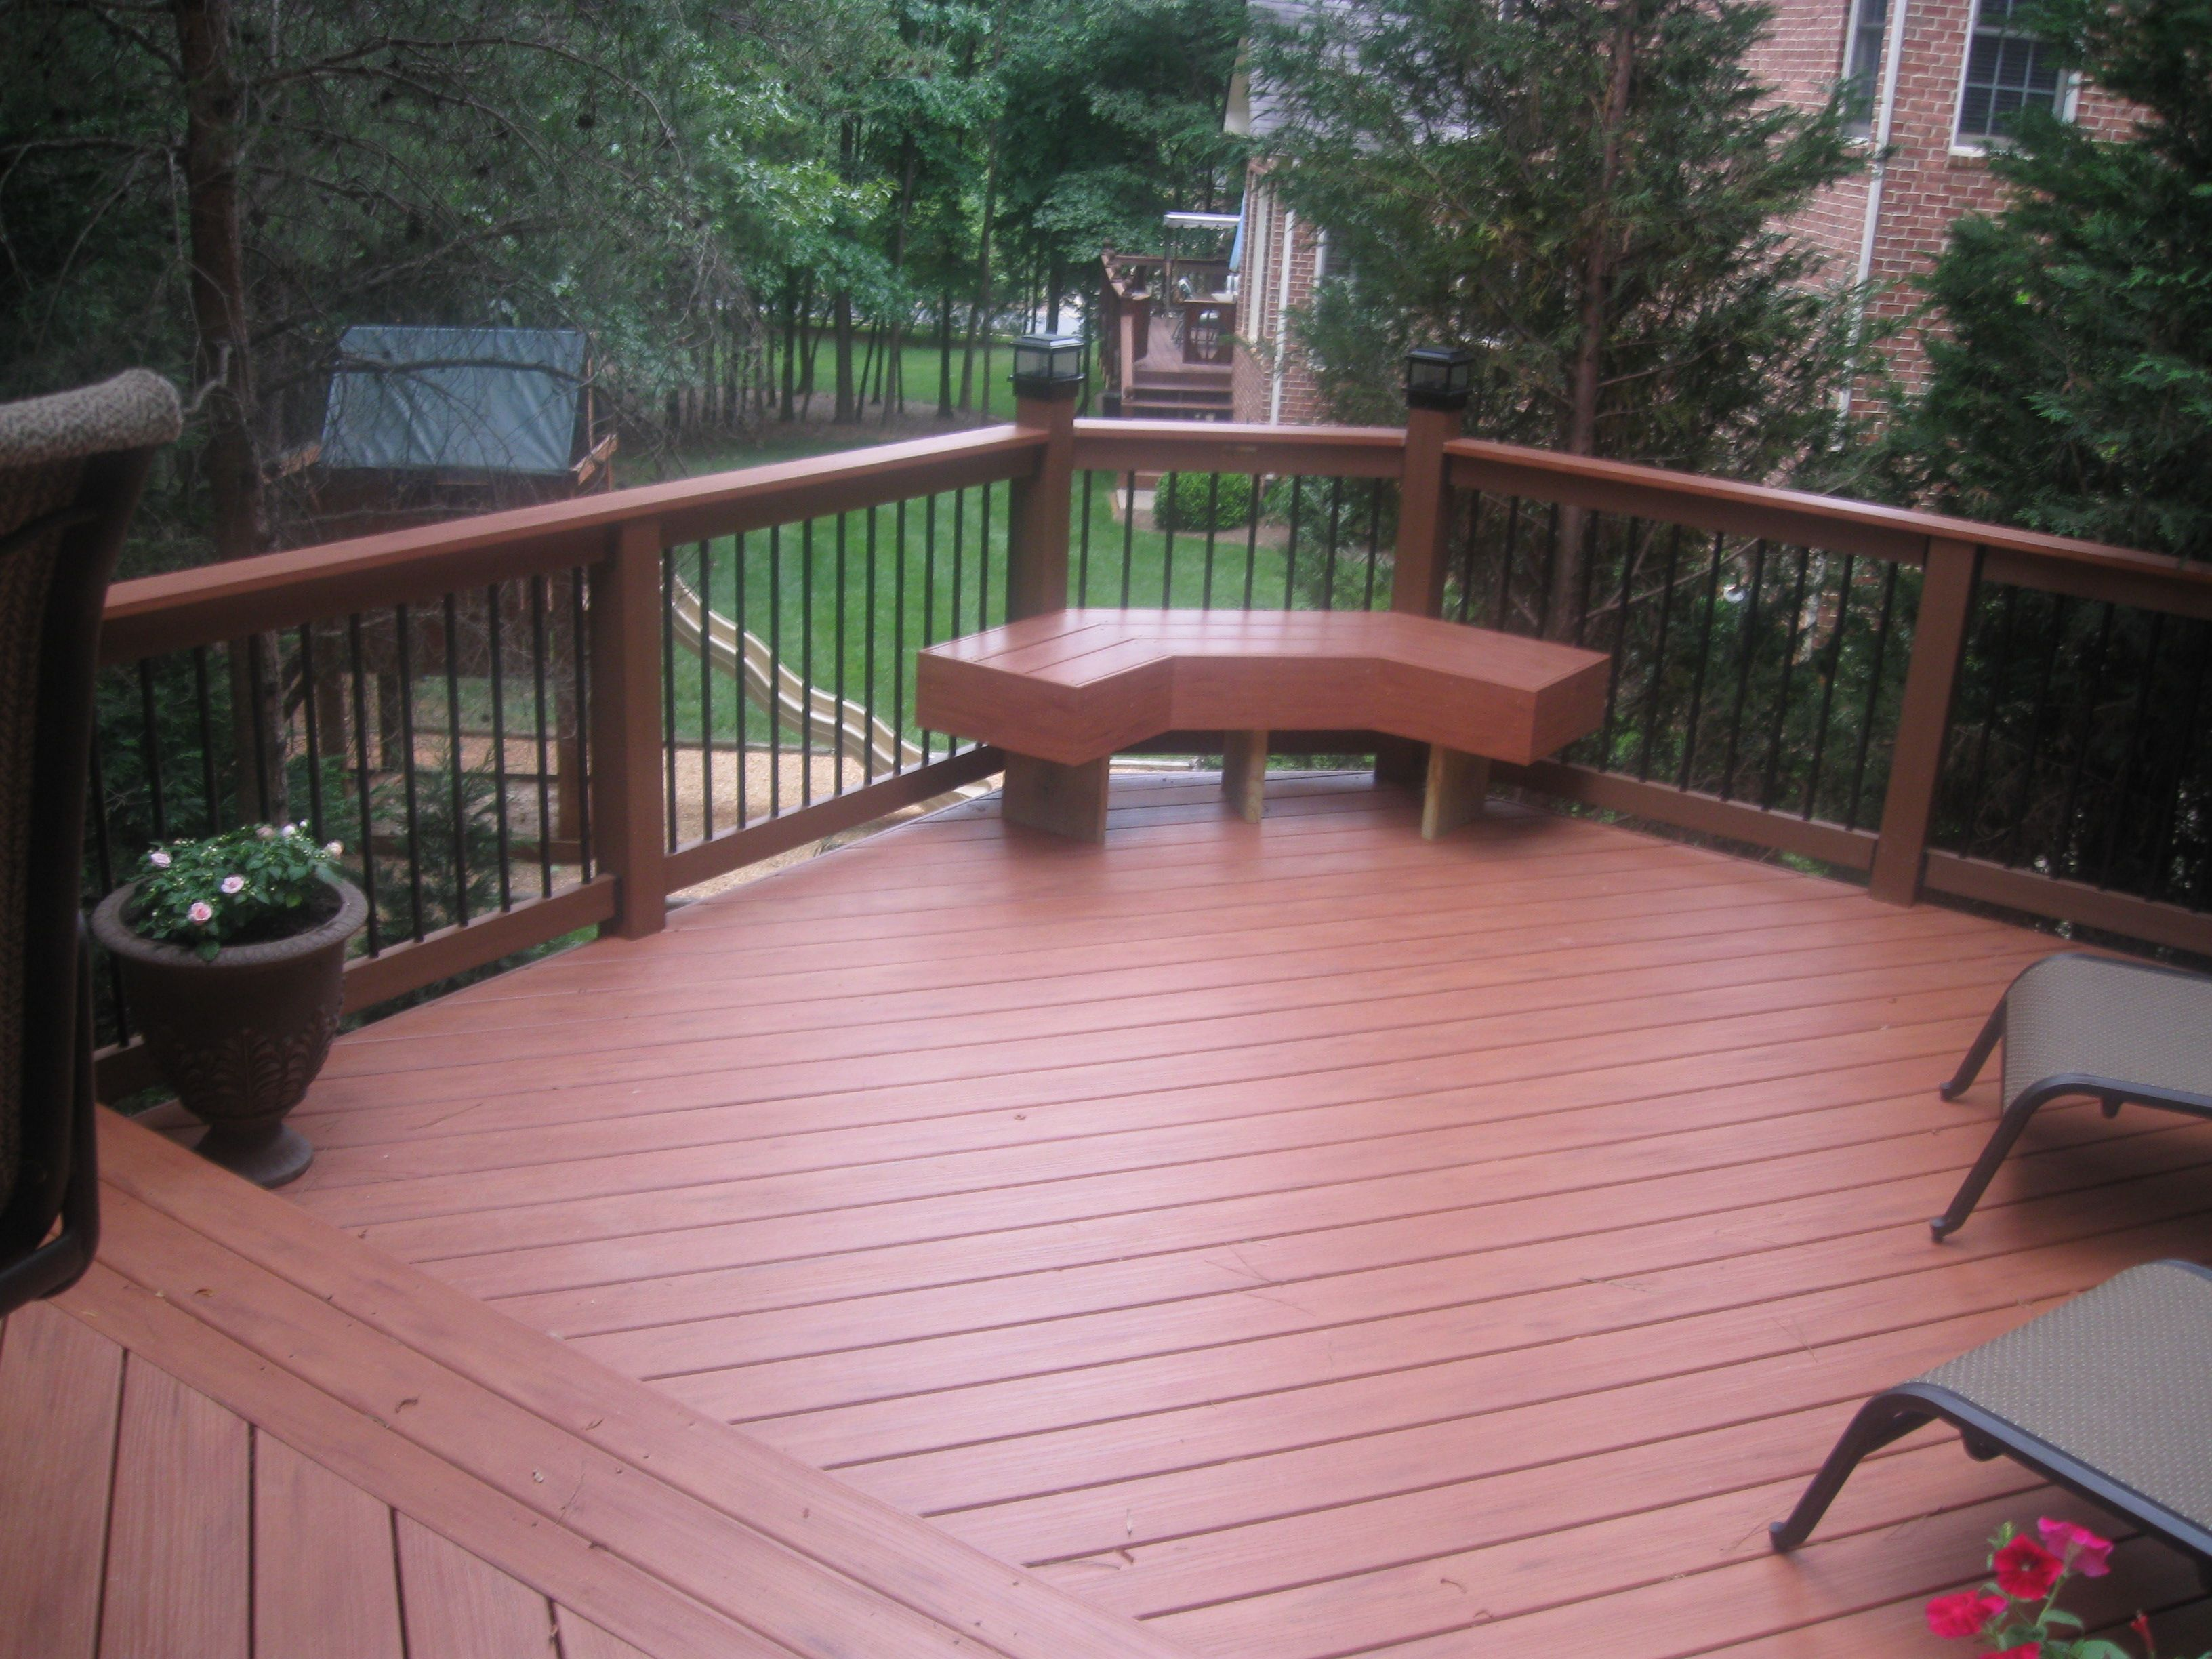 trex deck design ideas patio deck art designstrex contemporary - Trex Deck Design Ideas